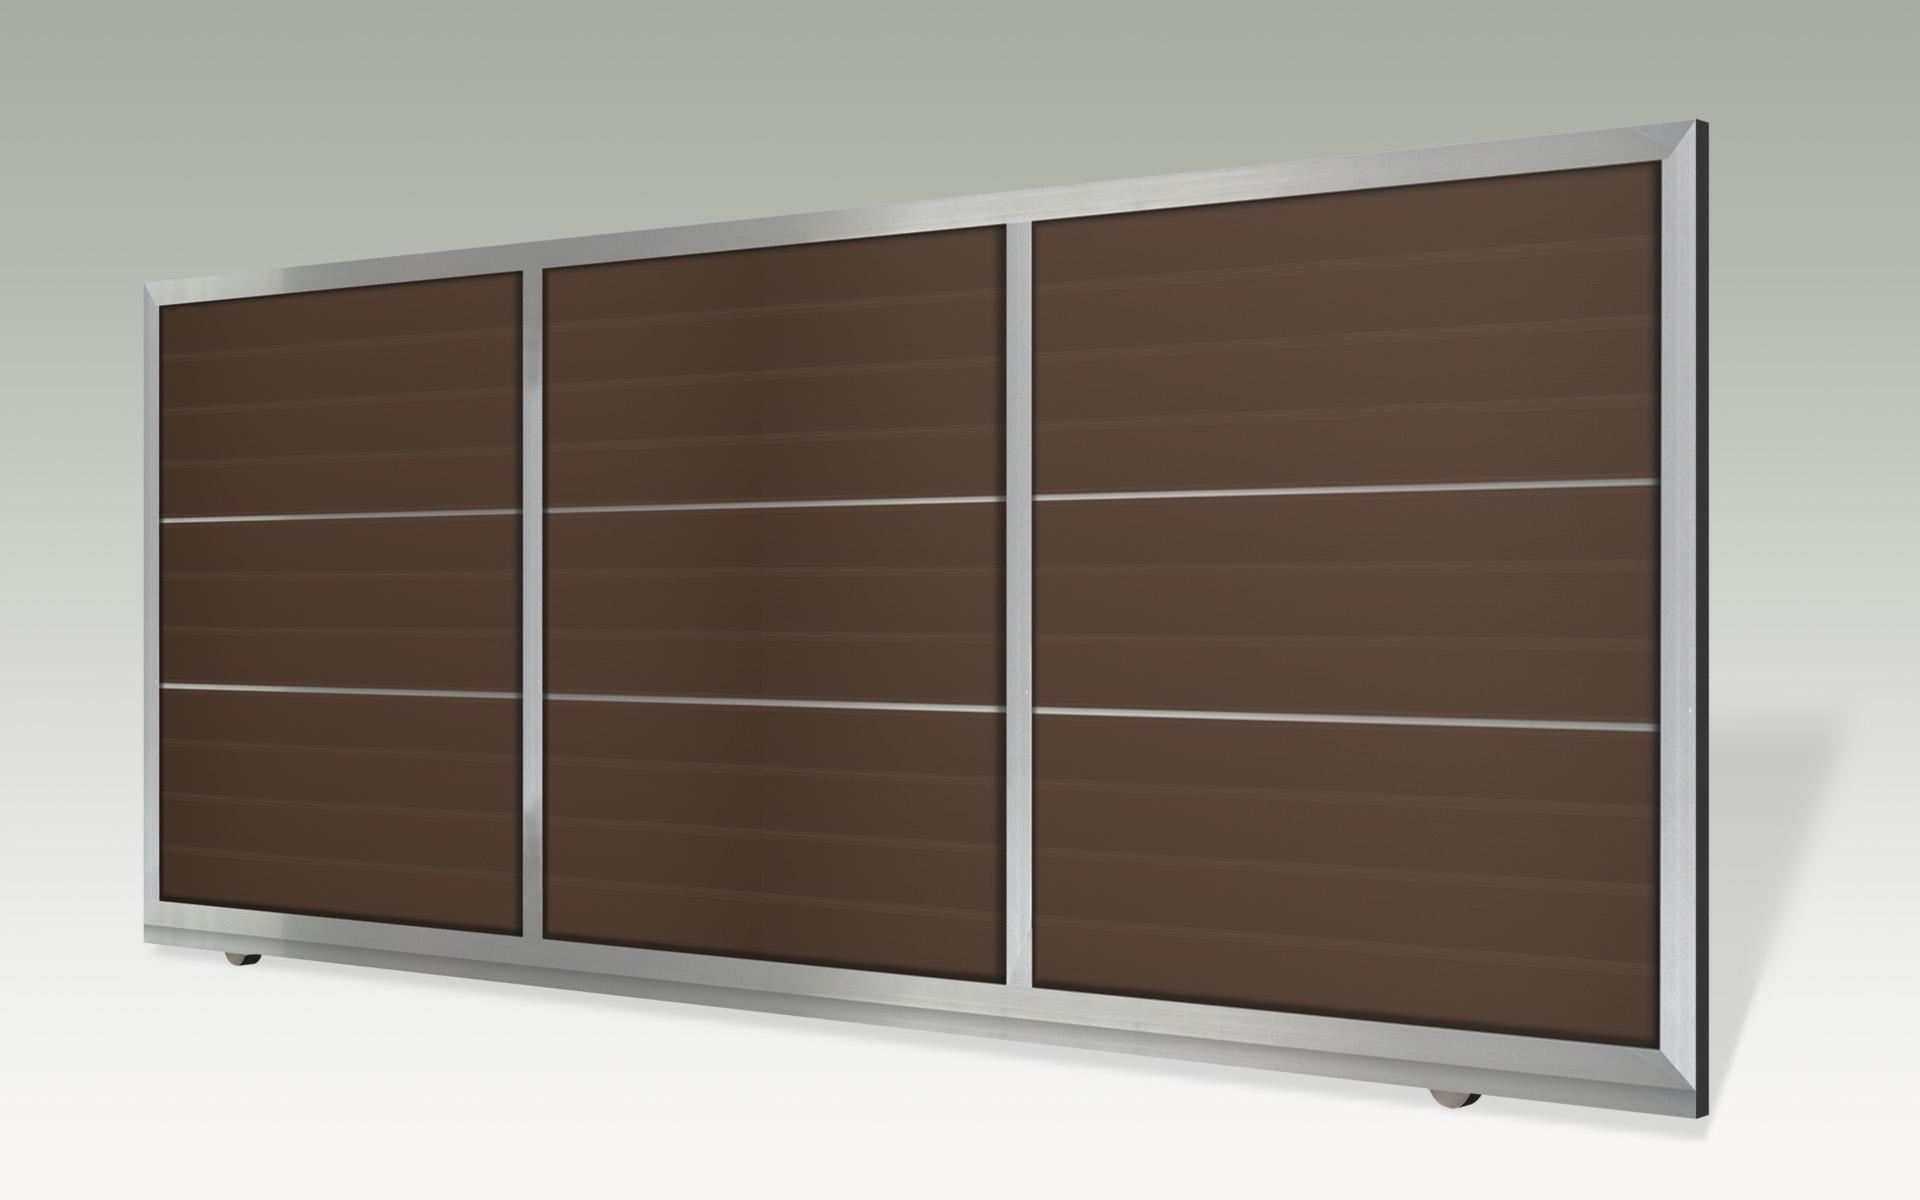 Styledoors ayloporta modern m490